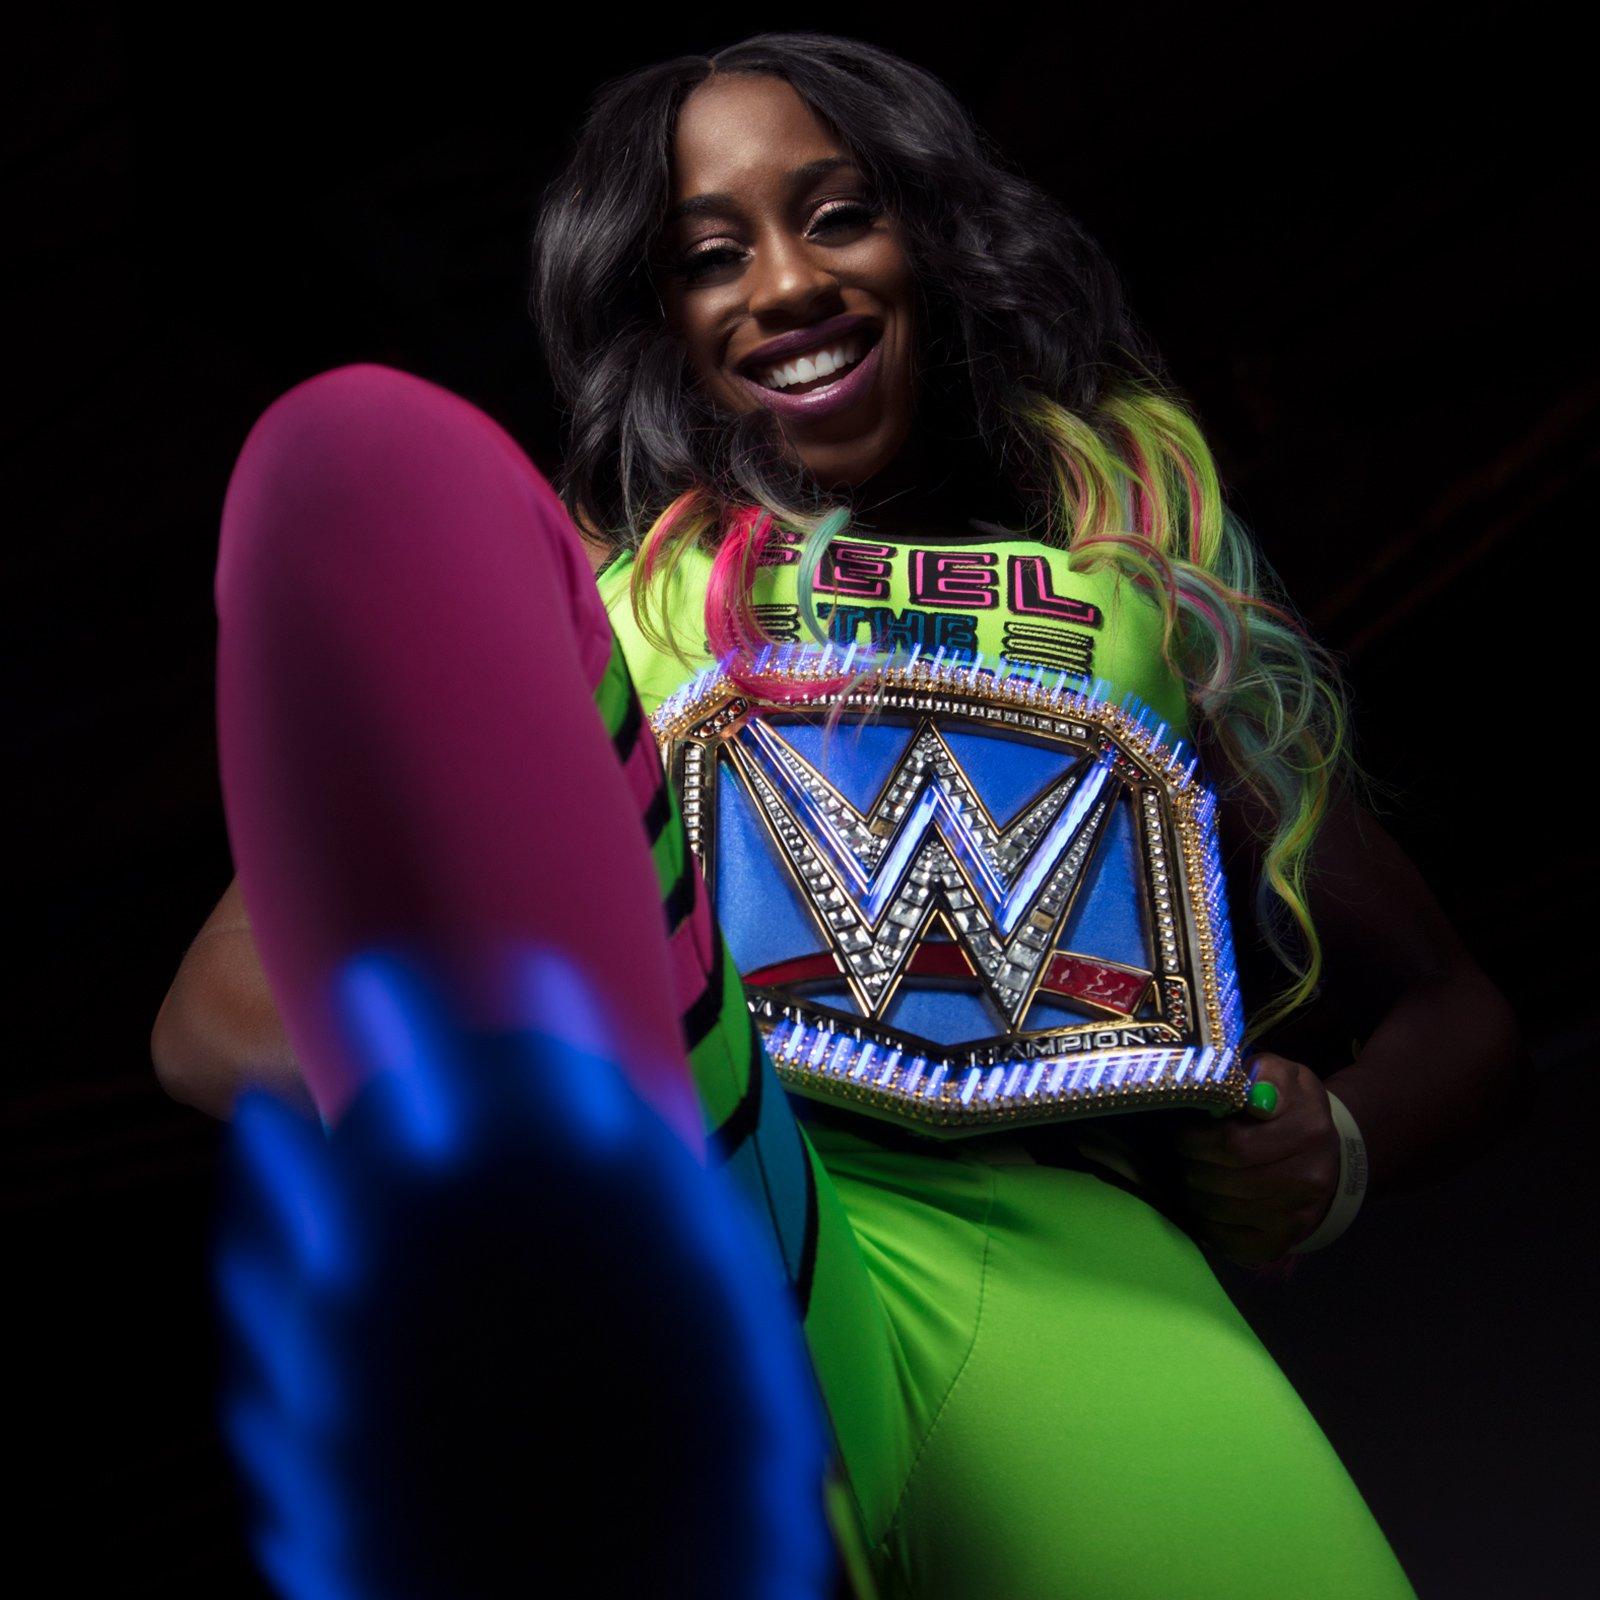 Naomi Model Sergei 2 Duo Forum: Naomi Shows Off The Glowing SmackDown Women's Championship